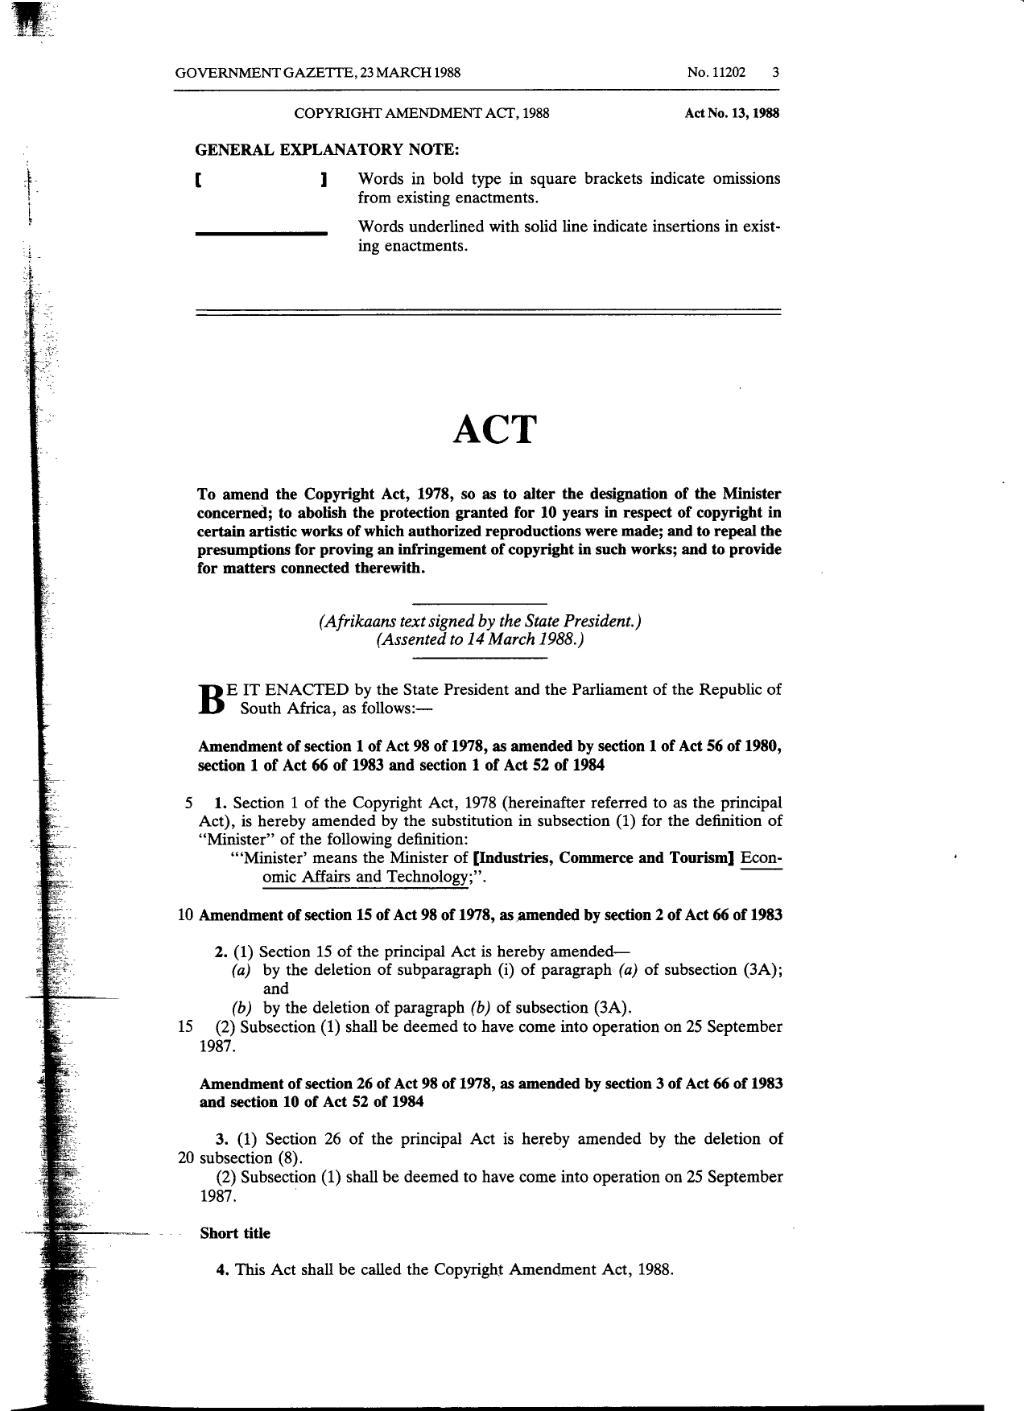 page:copyright amendment act 1988 from government gazette.djvu/2